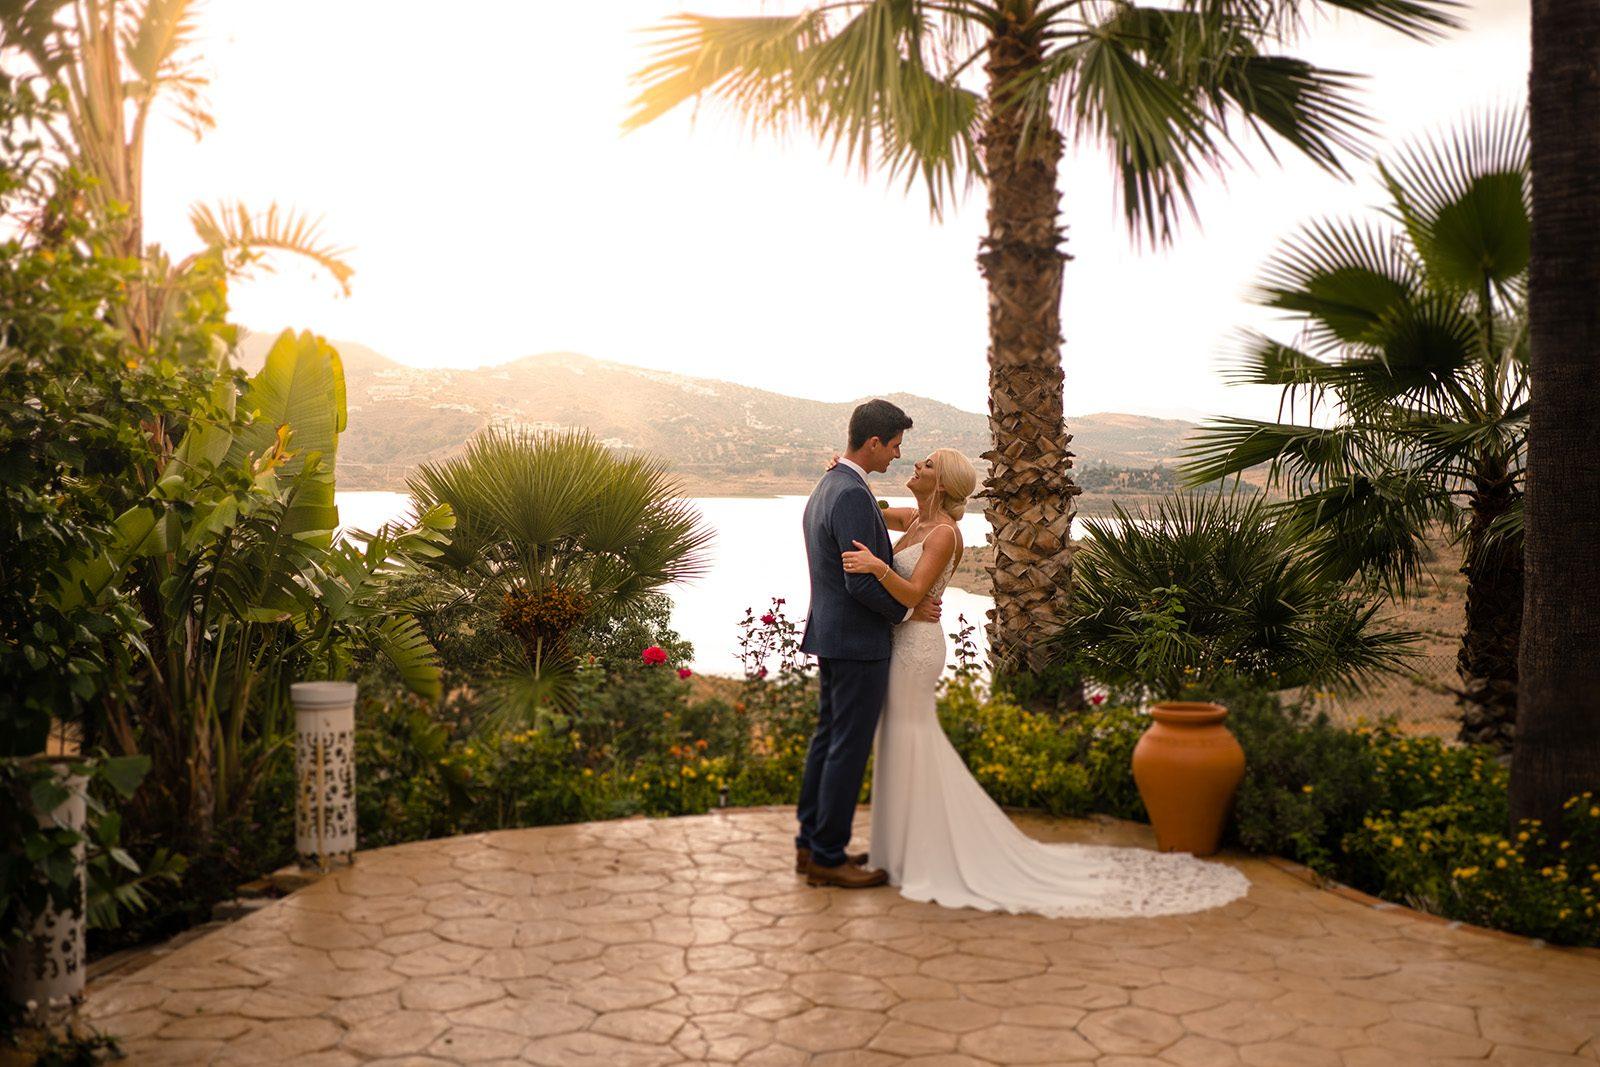 How to plan a destination wedding on a budget